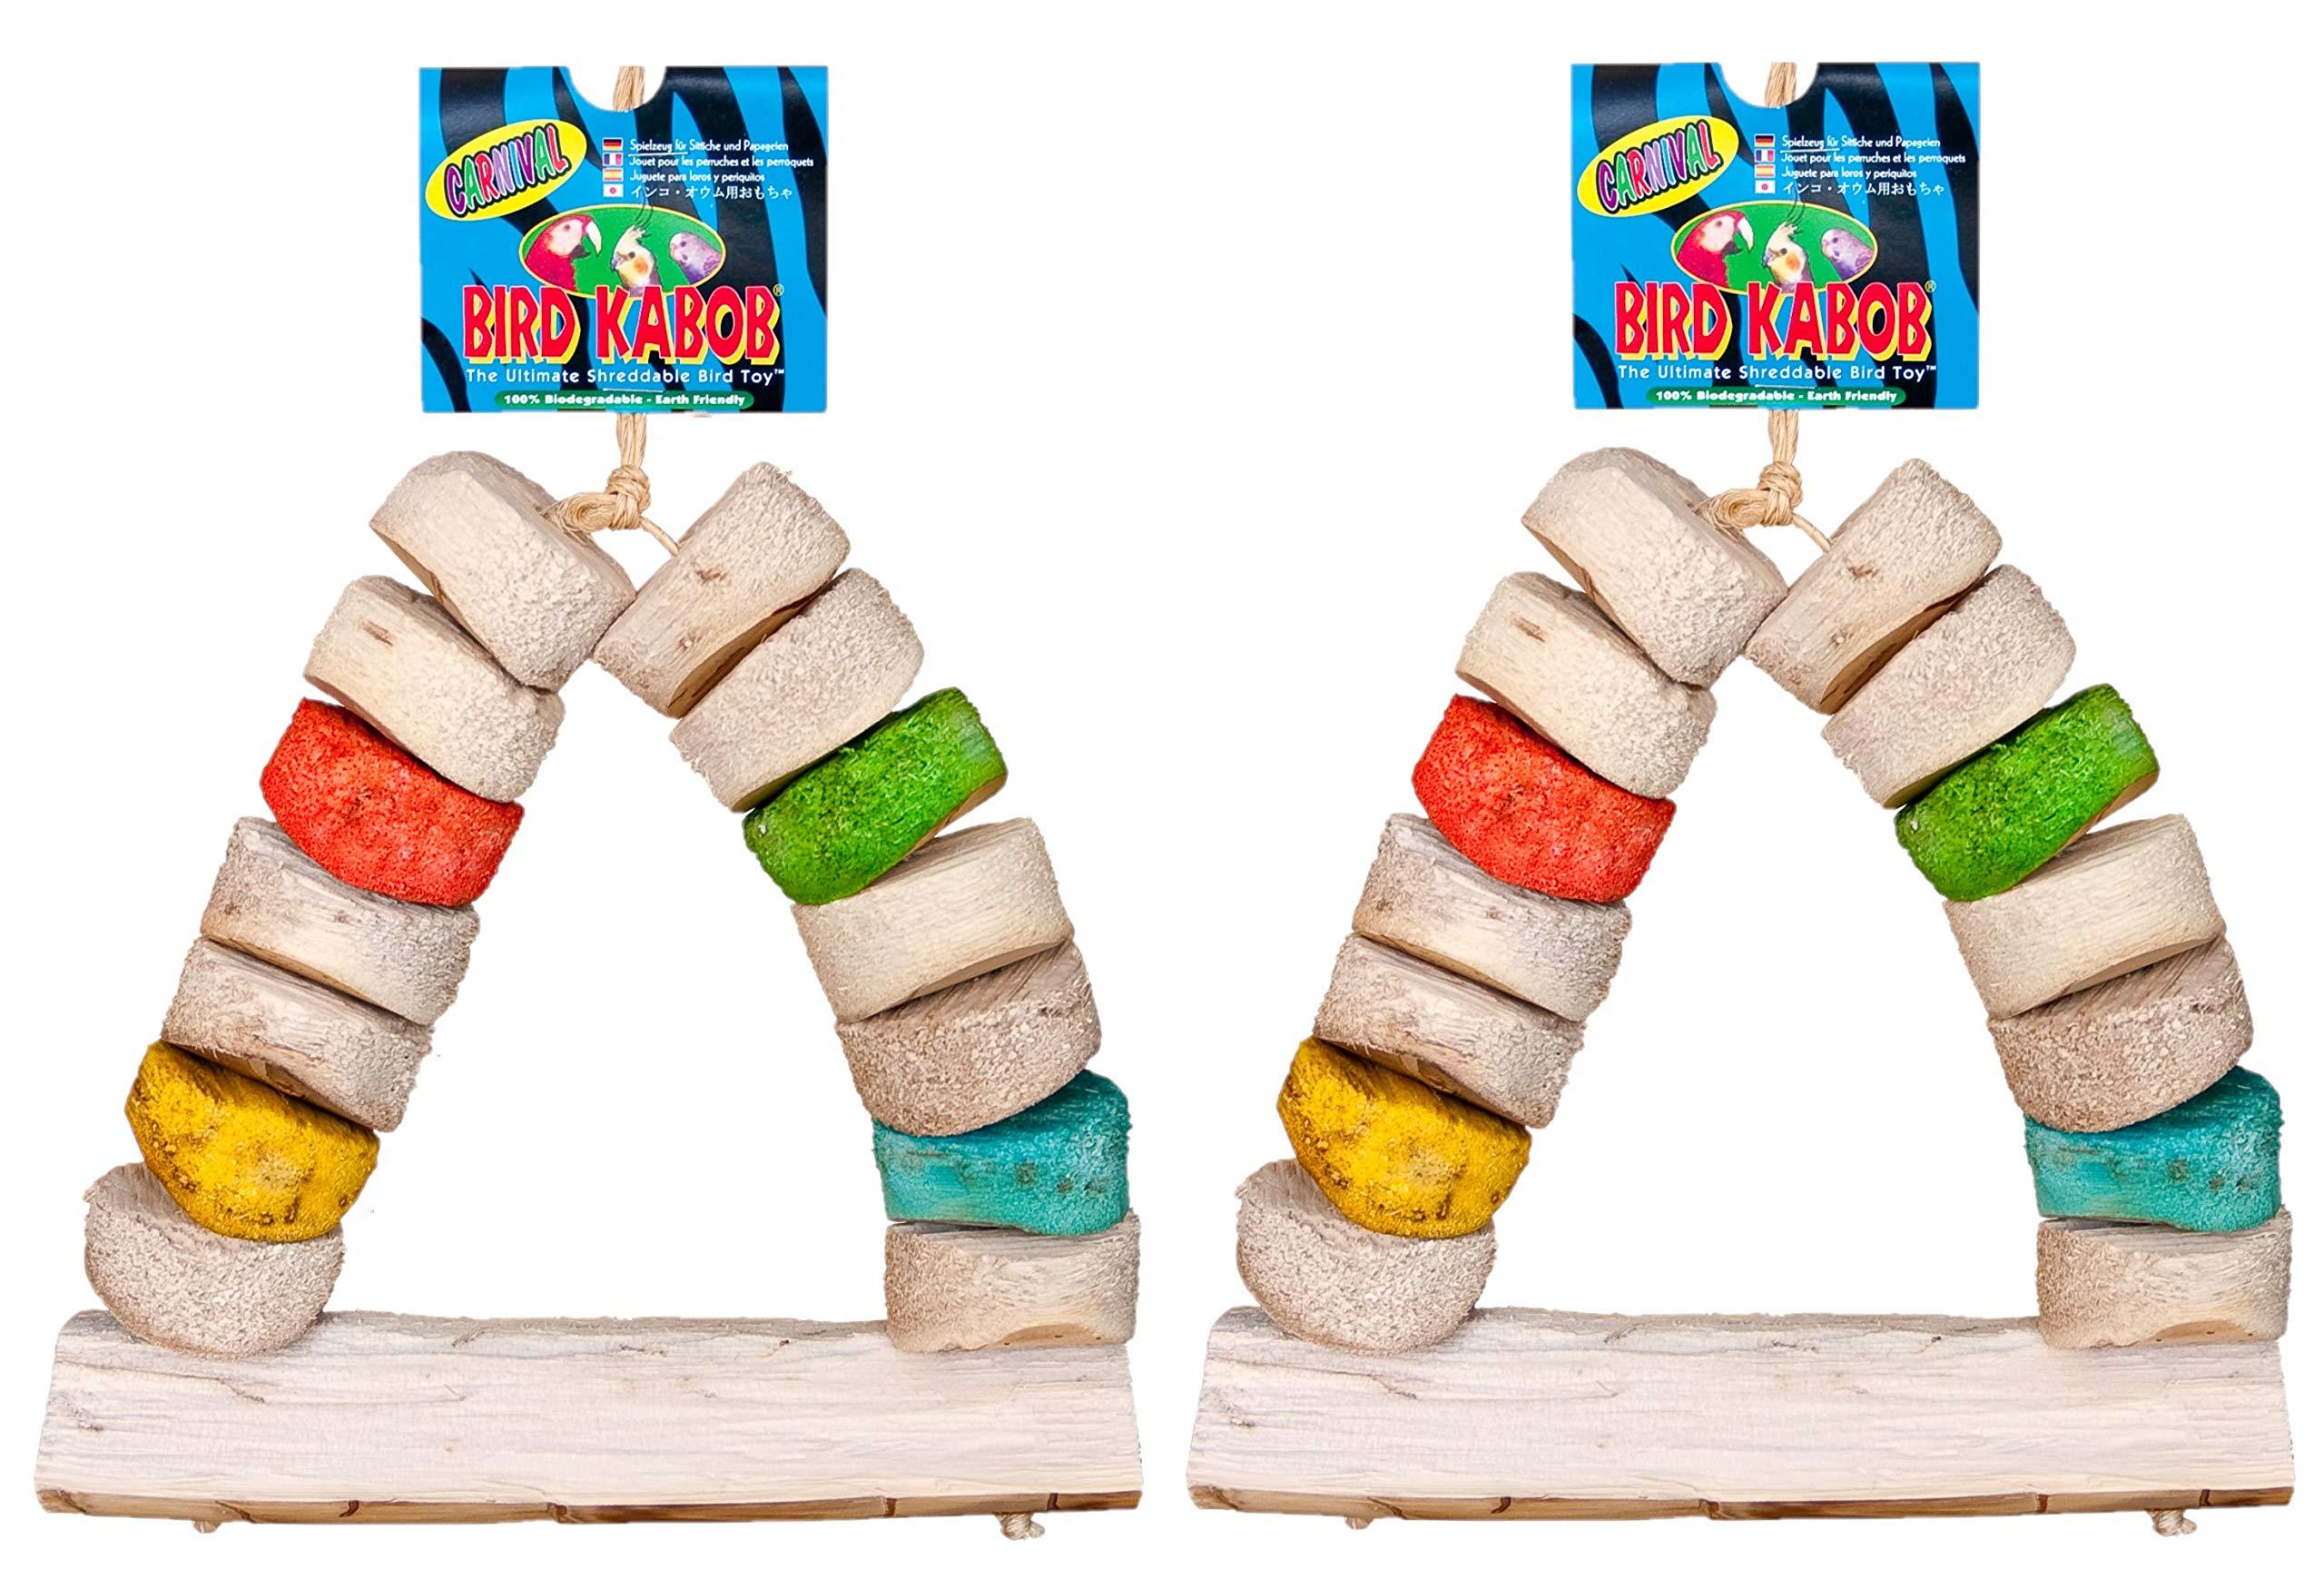 BIRD KABOB Wesco Shreddable Bird Perch Toy - Carnival 8.5'' Long x 13'' High - Pack of 2 by BIRD KABOB